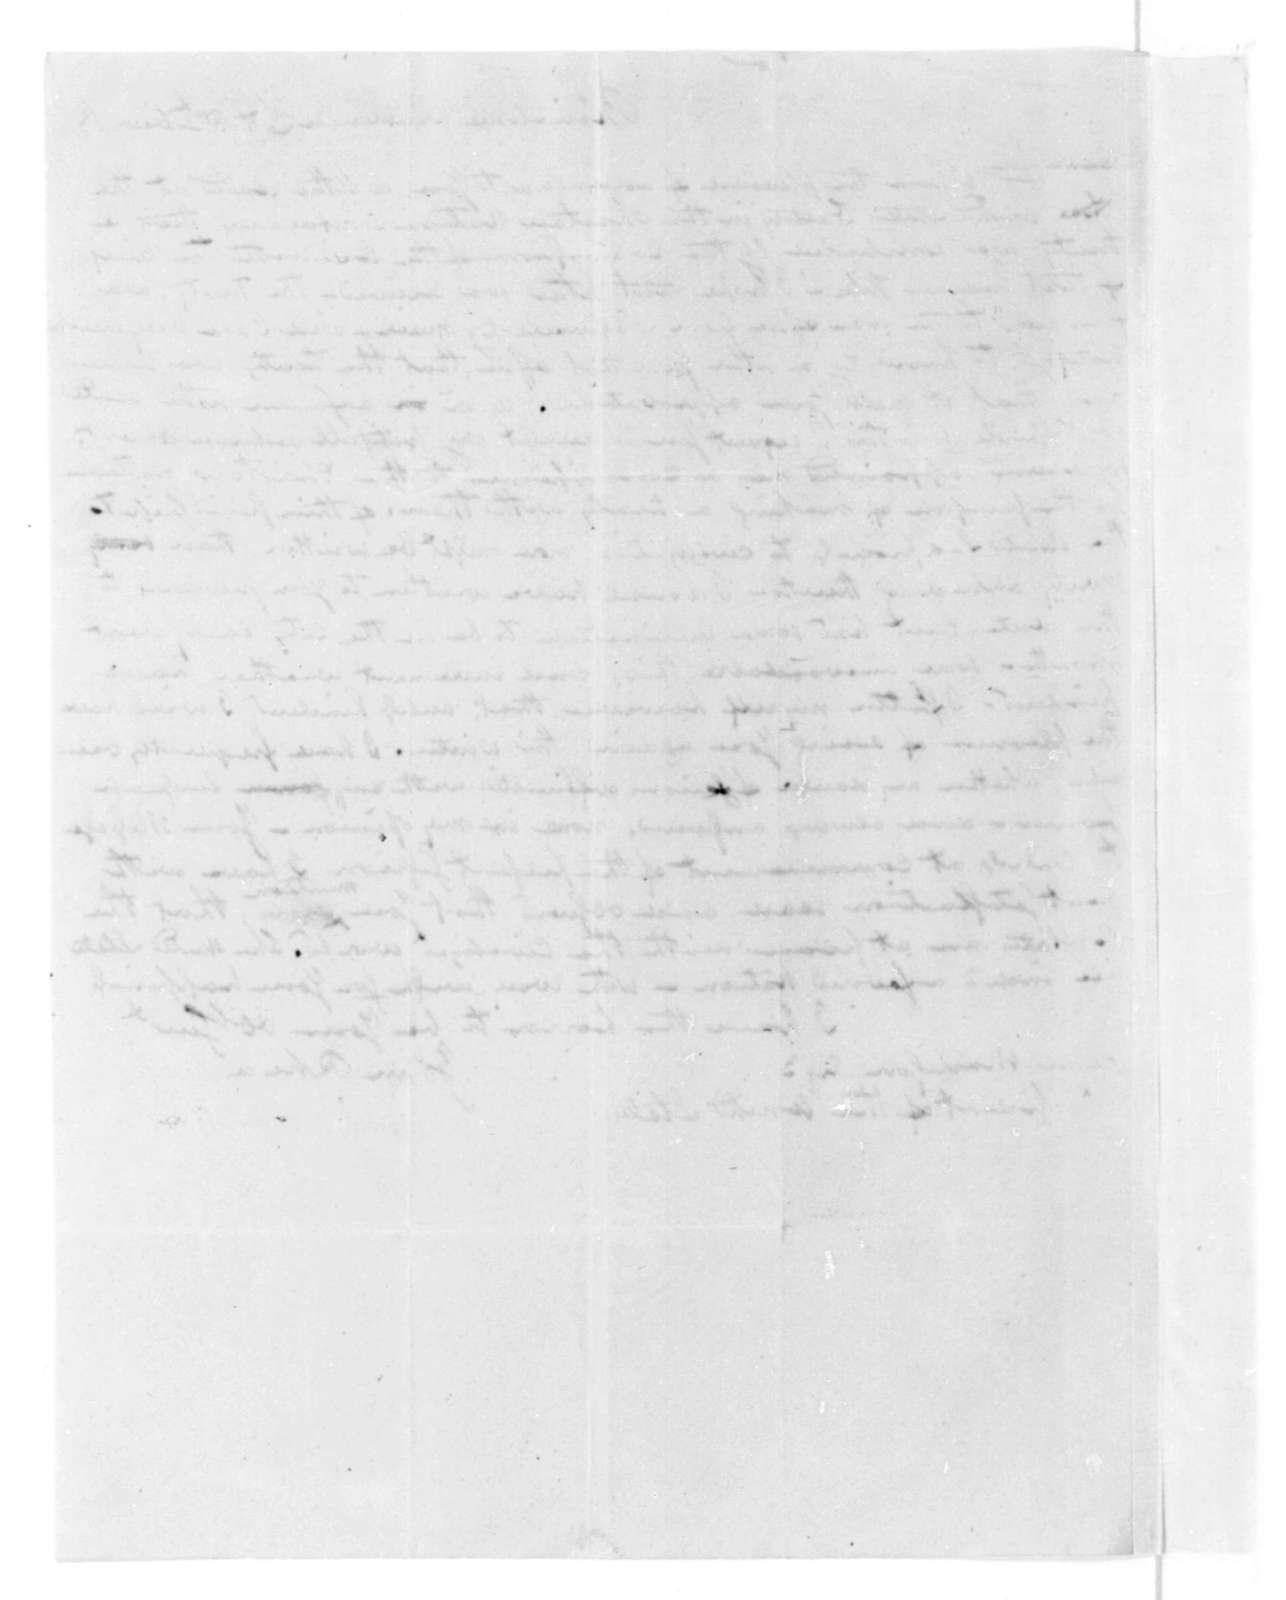 John Rhea to James Madison, December 31, 1816.